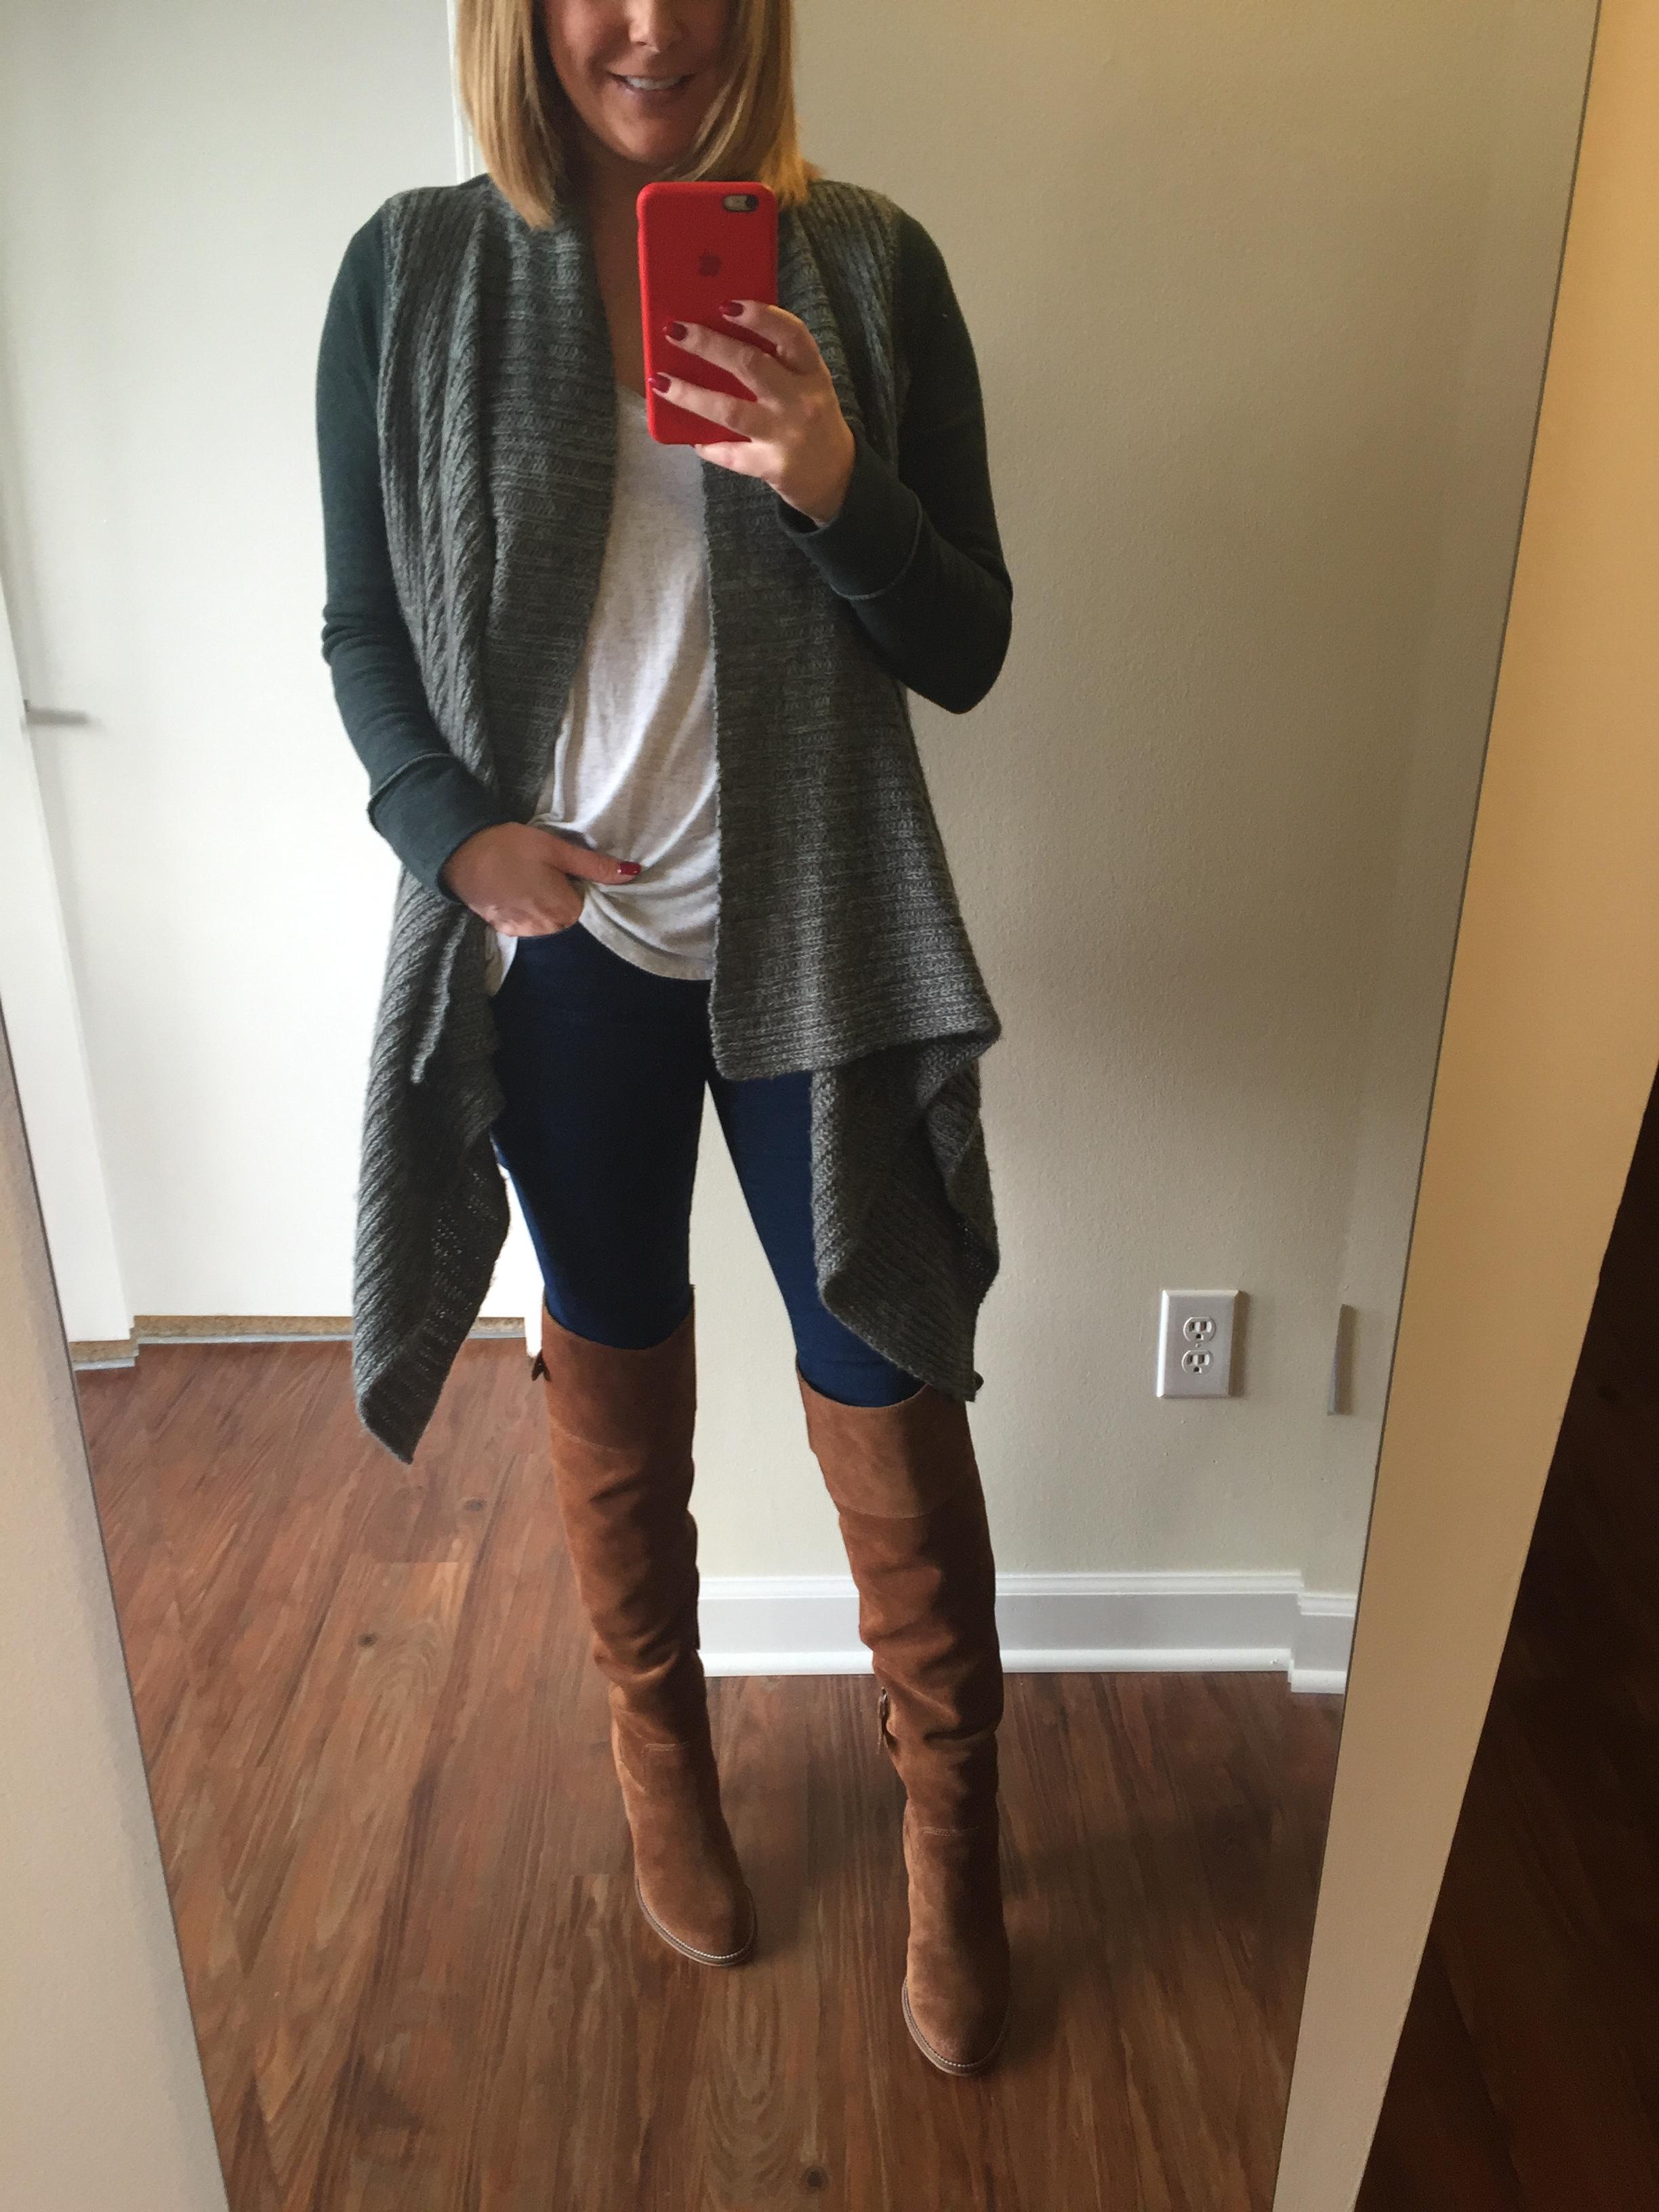 Sweater: Anthropologie, T-shirt:Anthropologie, Jeans: Gap,  1969 resolution legging jean , Boots: Dolce Vita,  OkanaKnee Boot